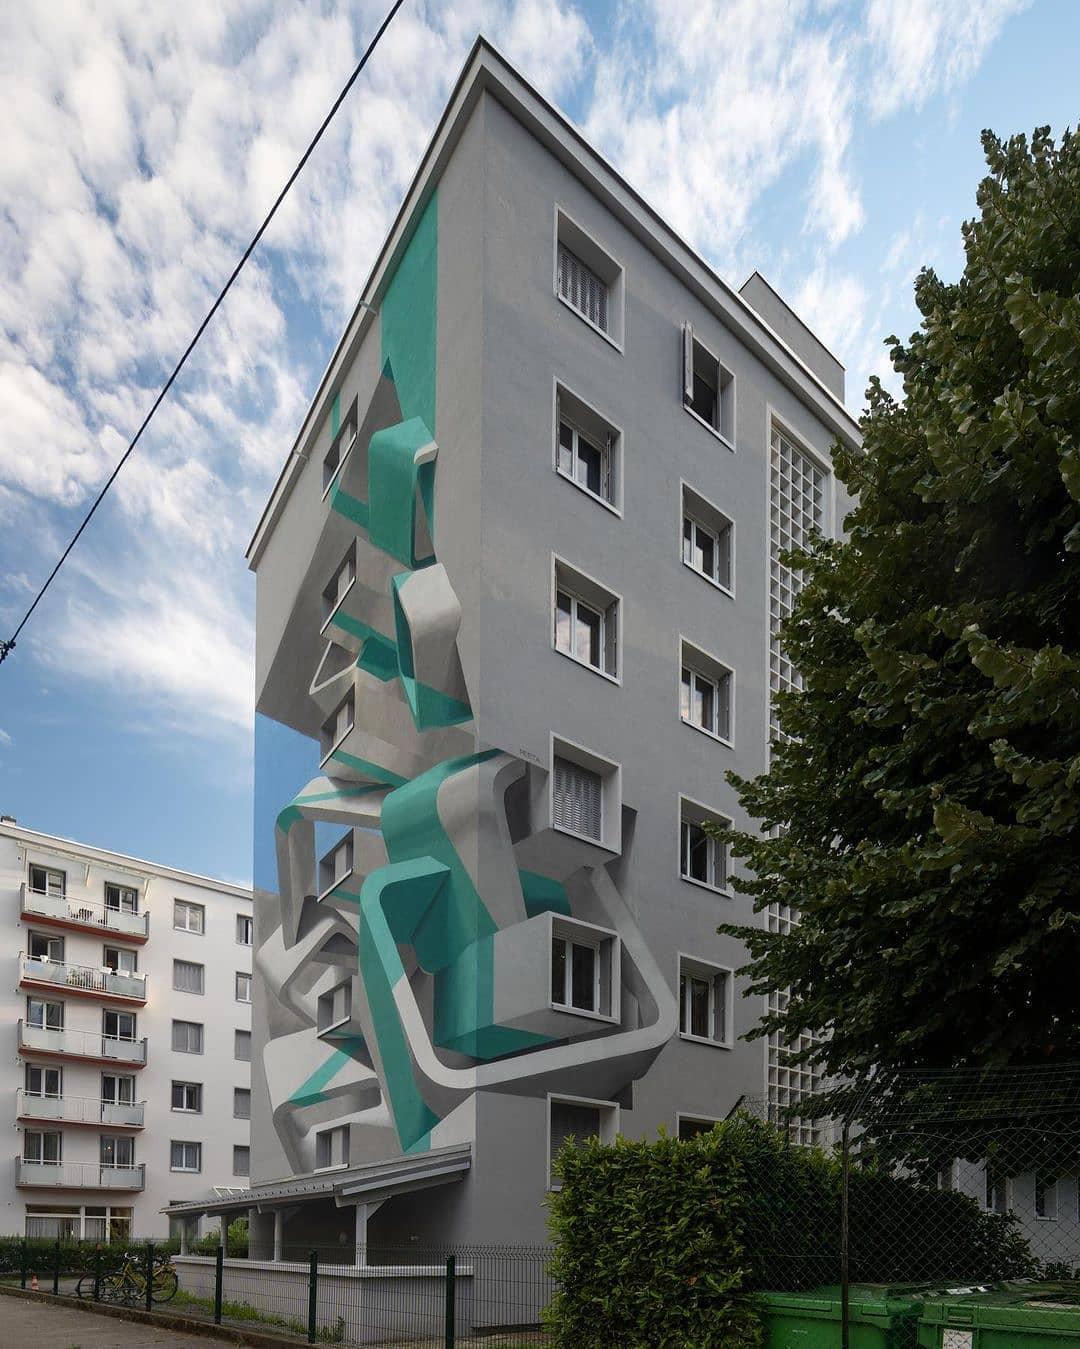 Peeta @ Grenoble, France